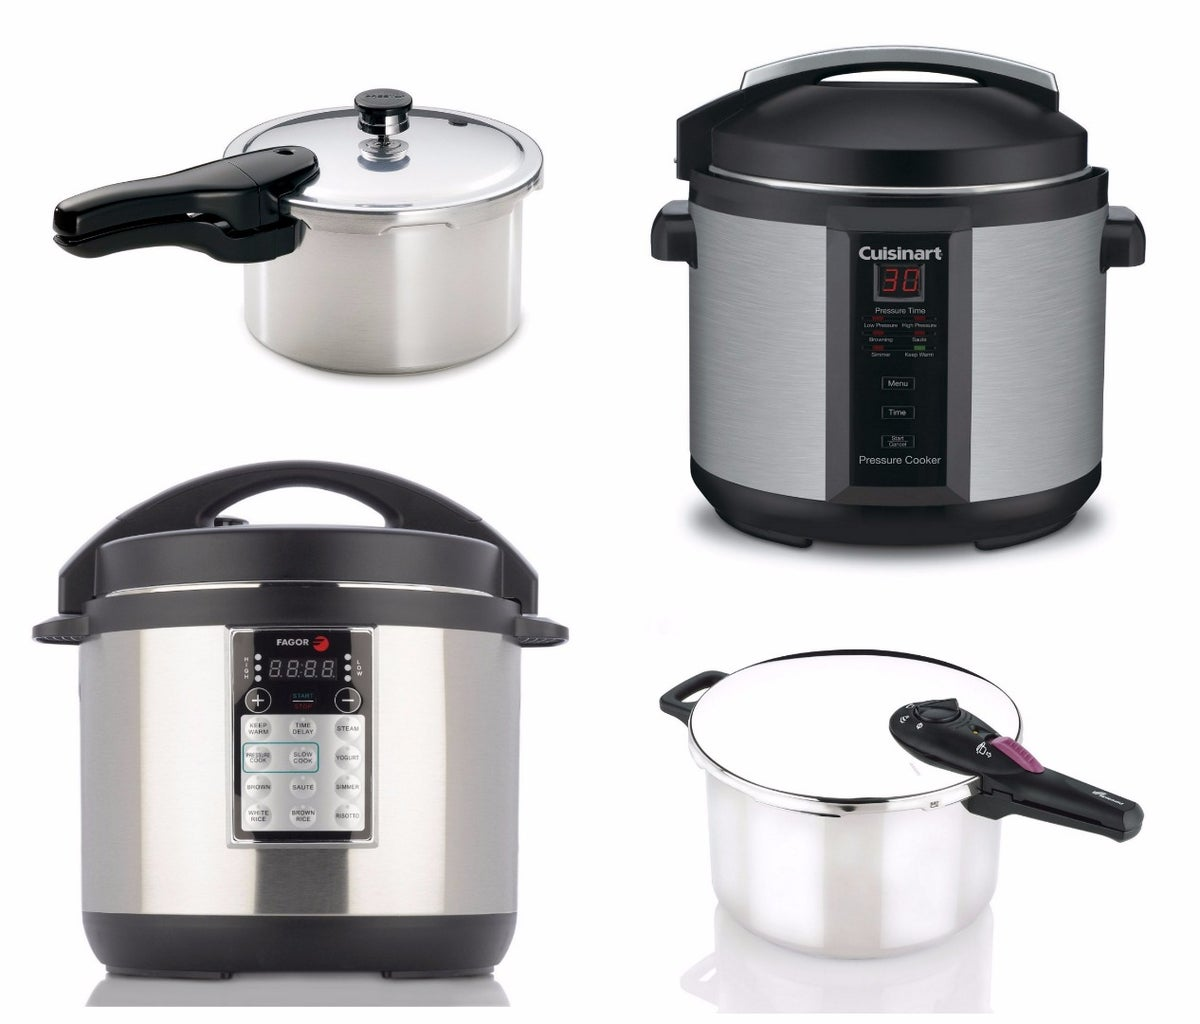 Choosing a Pressure Cooker